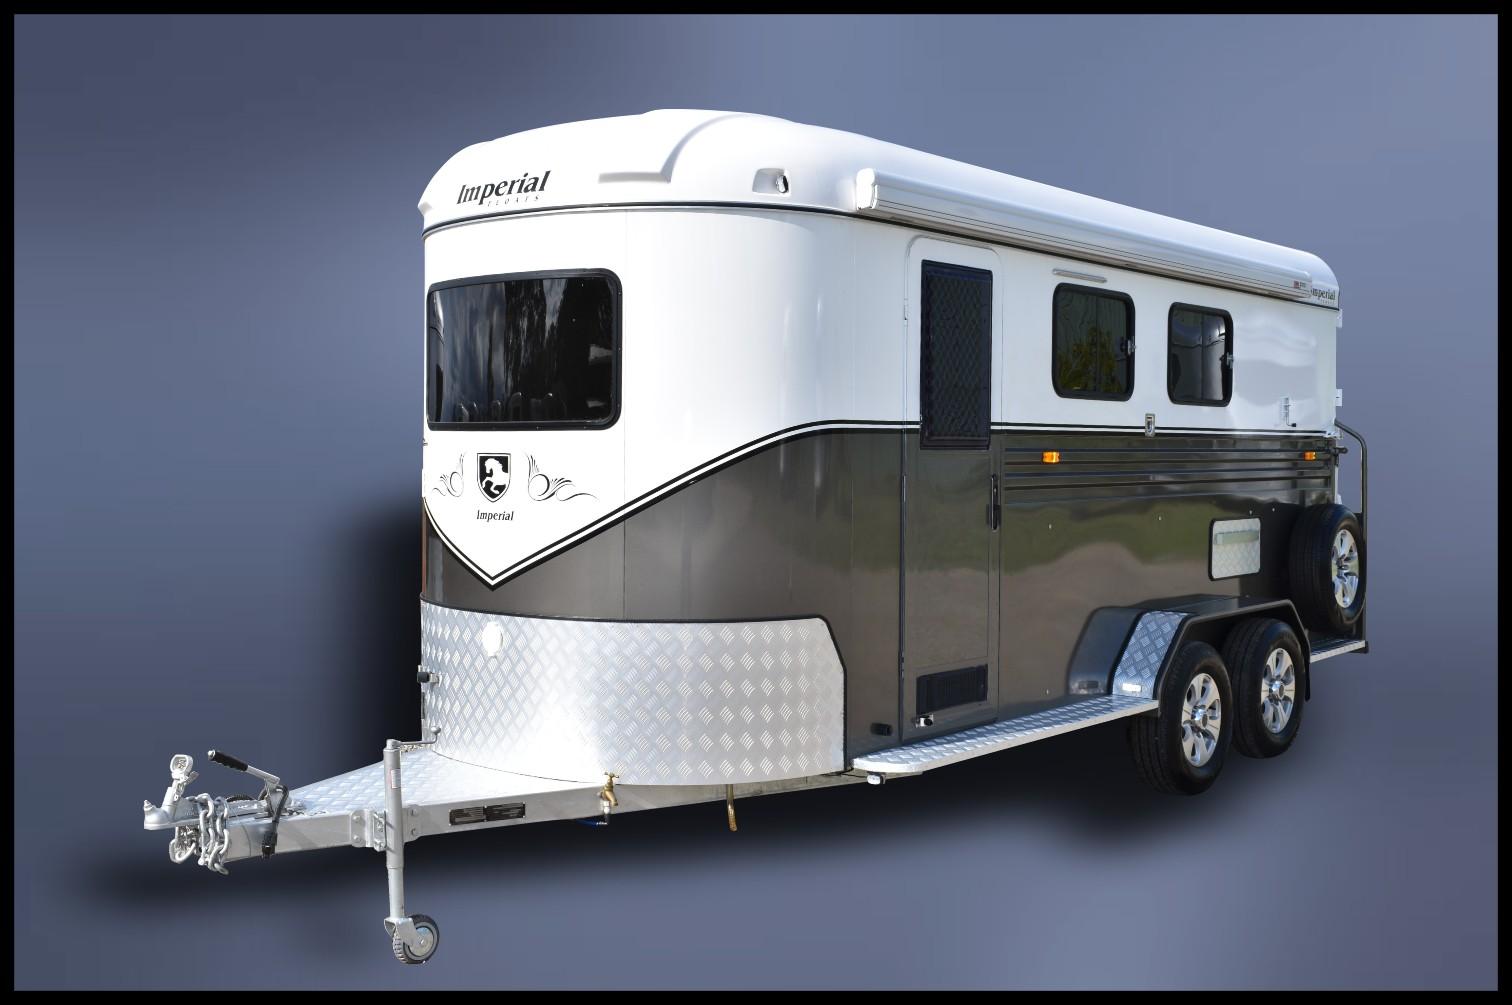 Horse Floats For Sale In Nsw Australia Imperial Windsor Caravan Wiring Diagram Ultimate Luxury